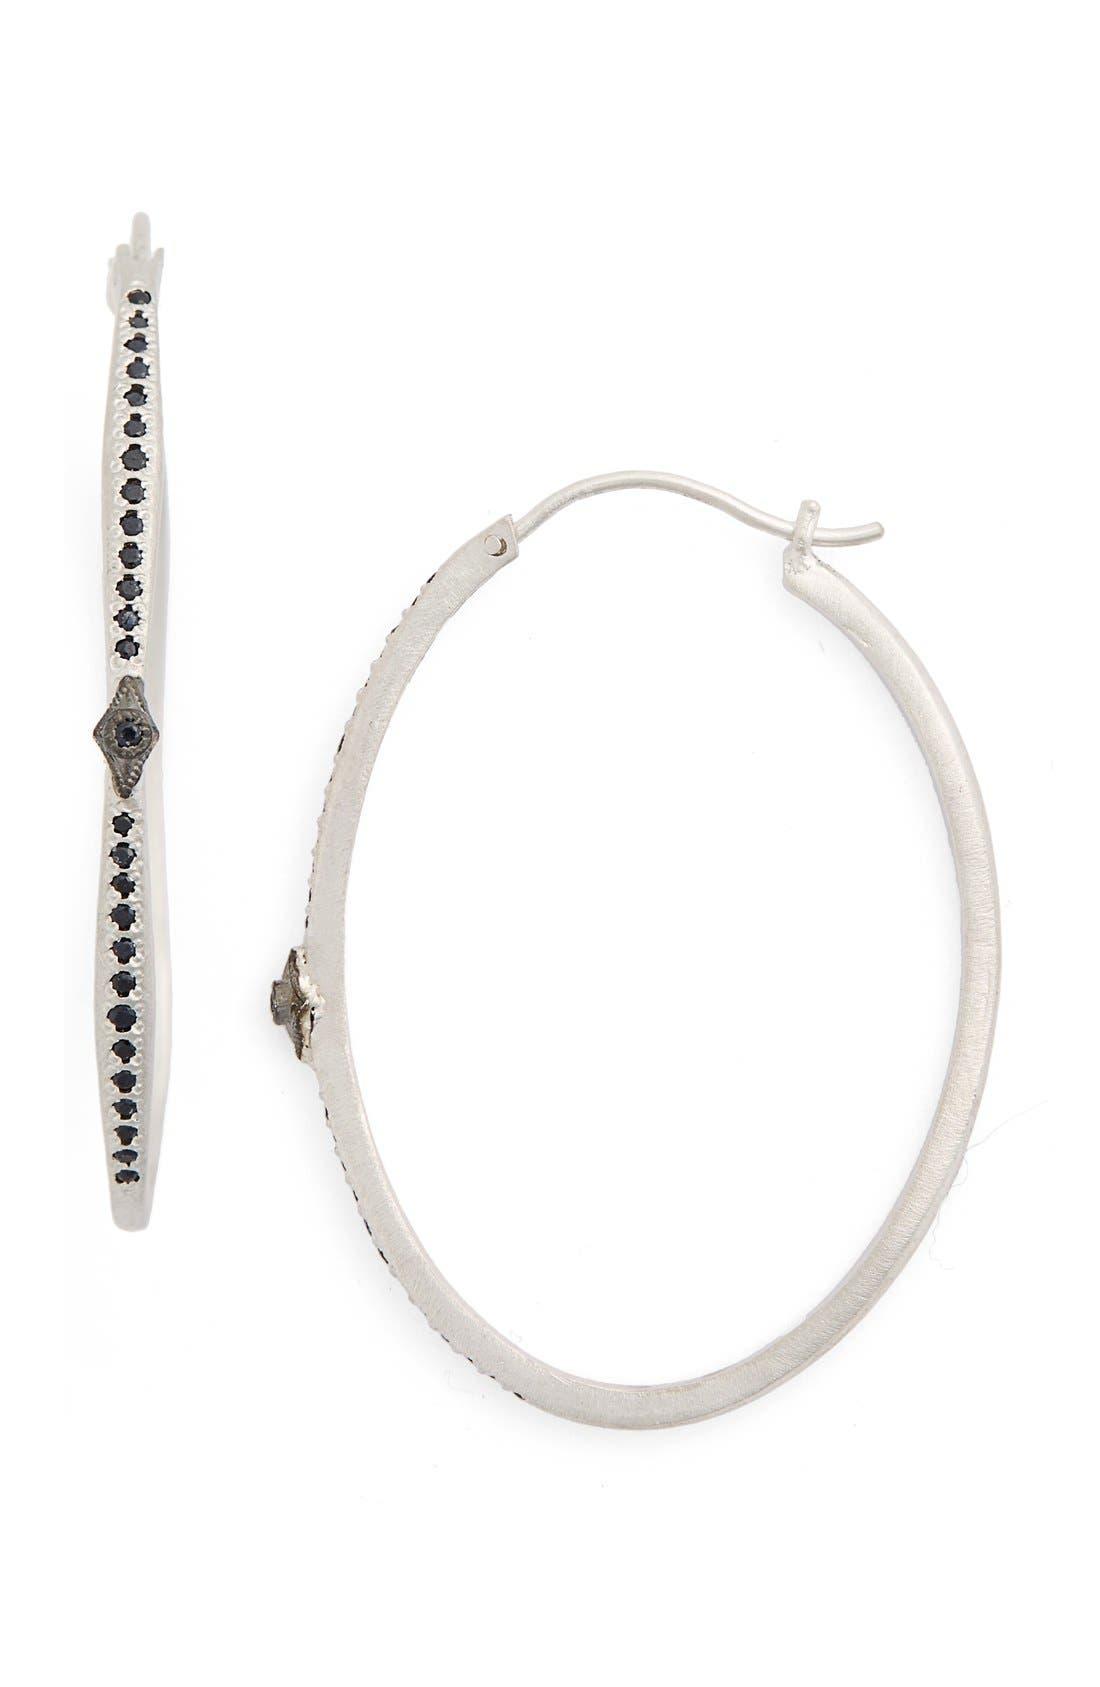 New World Black Sapphire Hoop Earrings,                             Main thumbnail 1, color,                             Silver